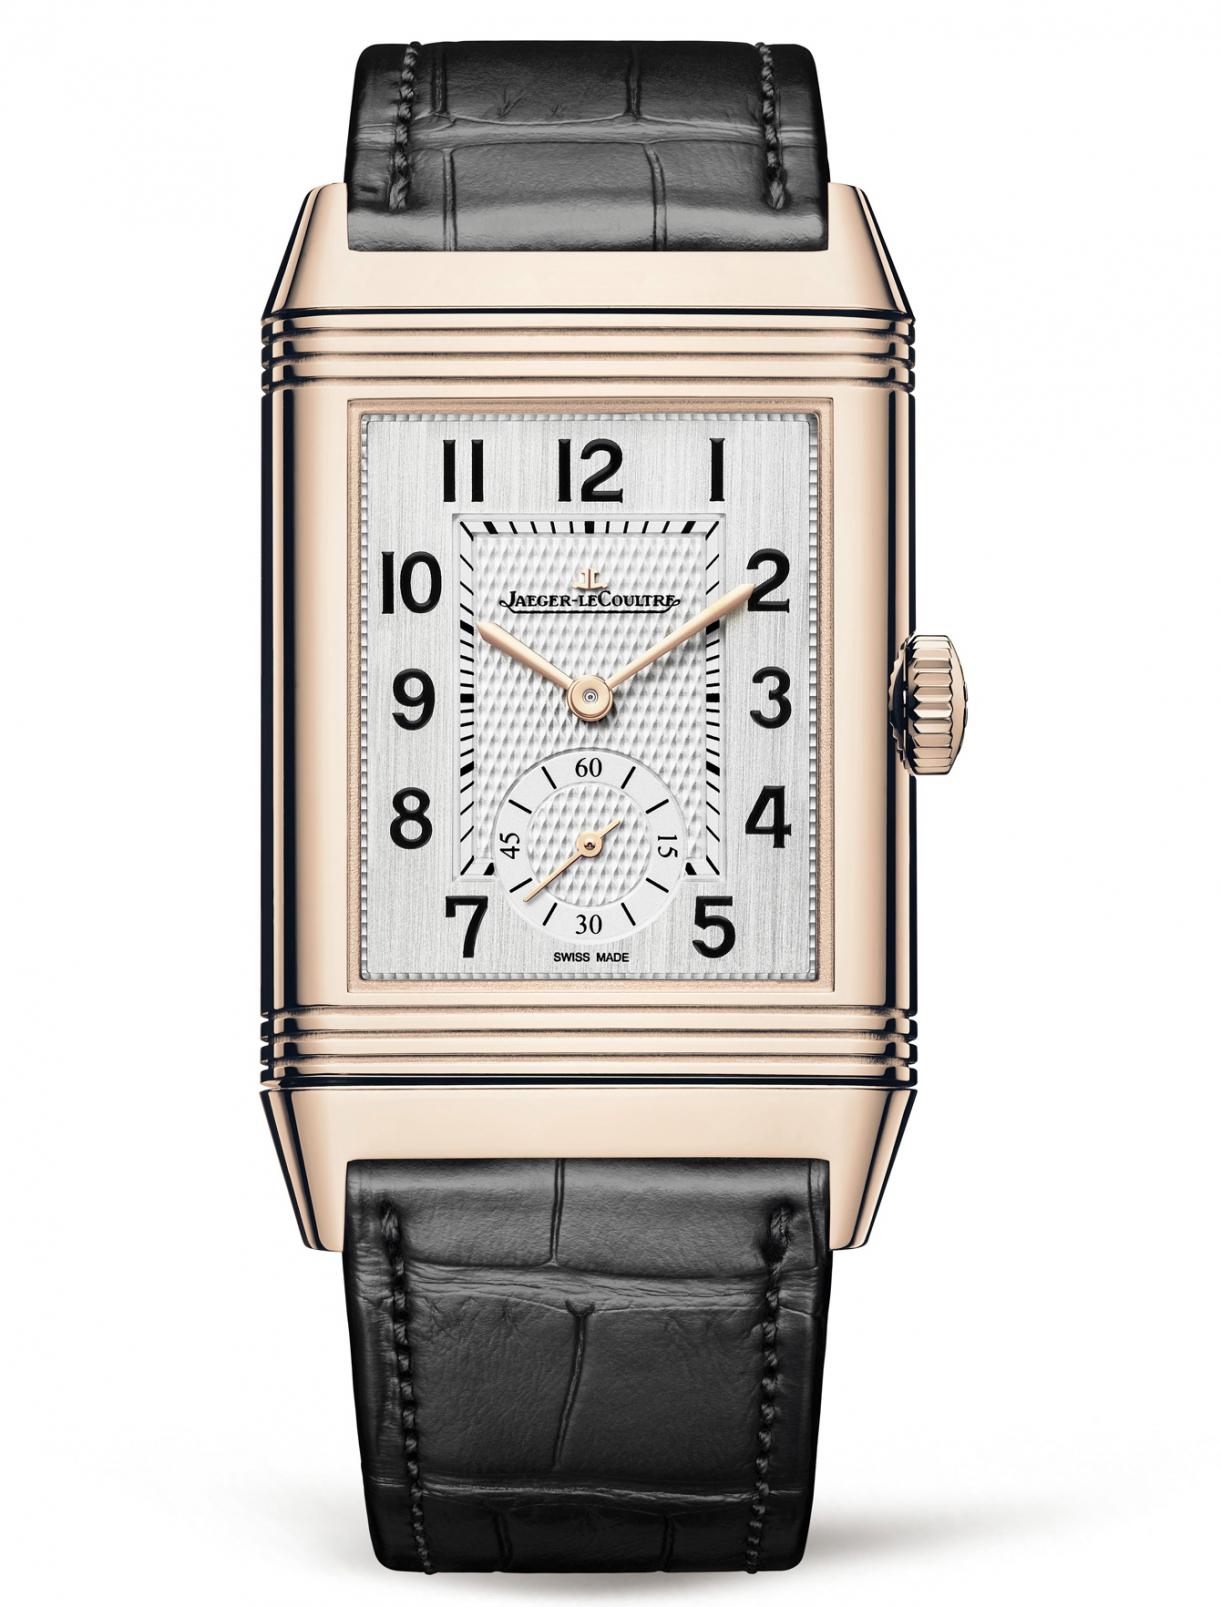 Часы Q3842520 Reverso Jaeger-LeCoultre  –  Общий вид